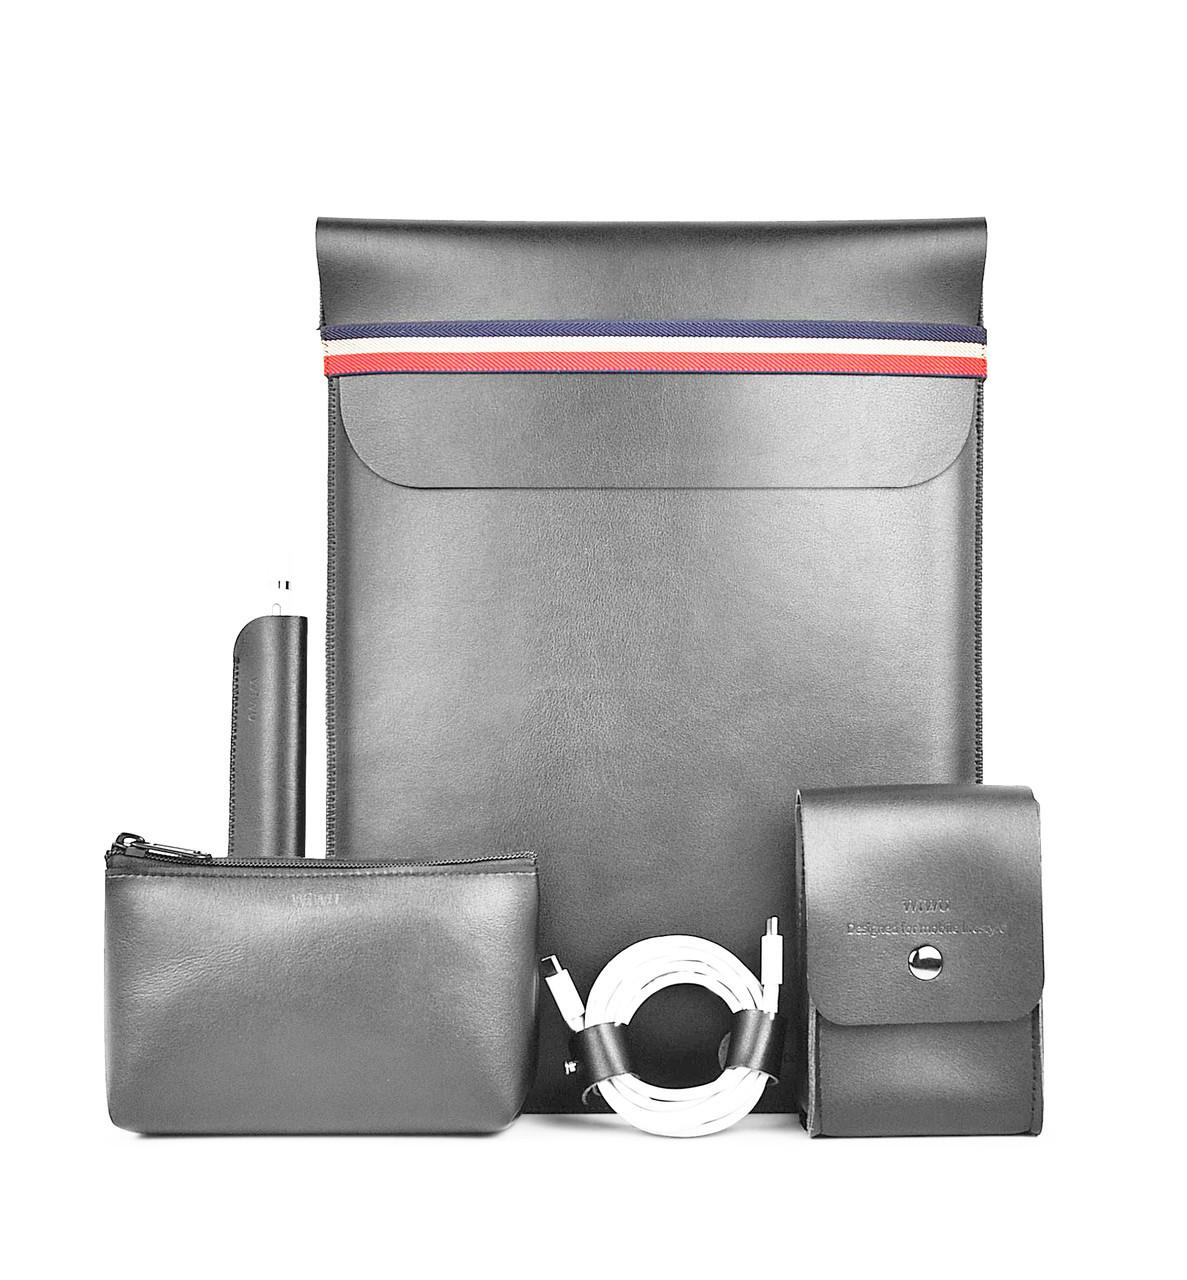 ✅ Сумка для ноутбука MacBook Wiwu Elite set 5in1 13.3'' gray